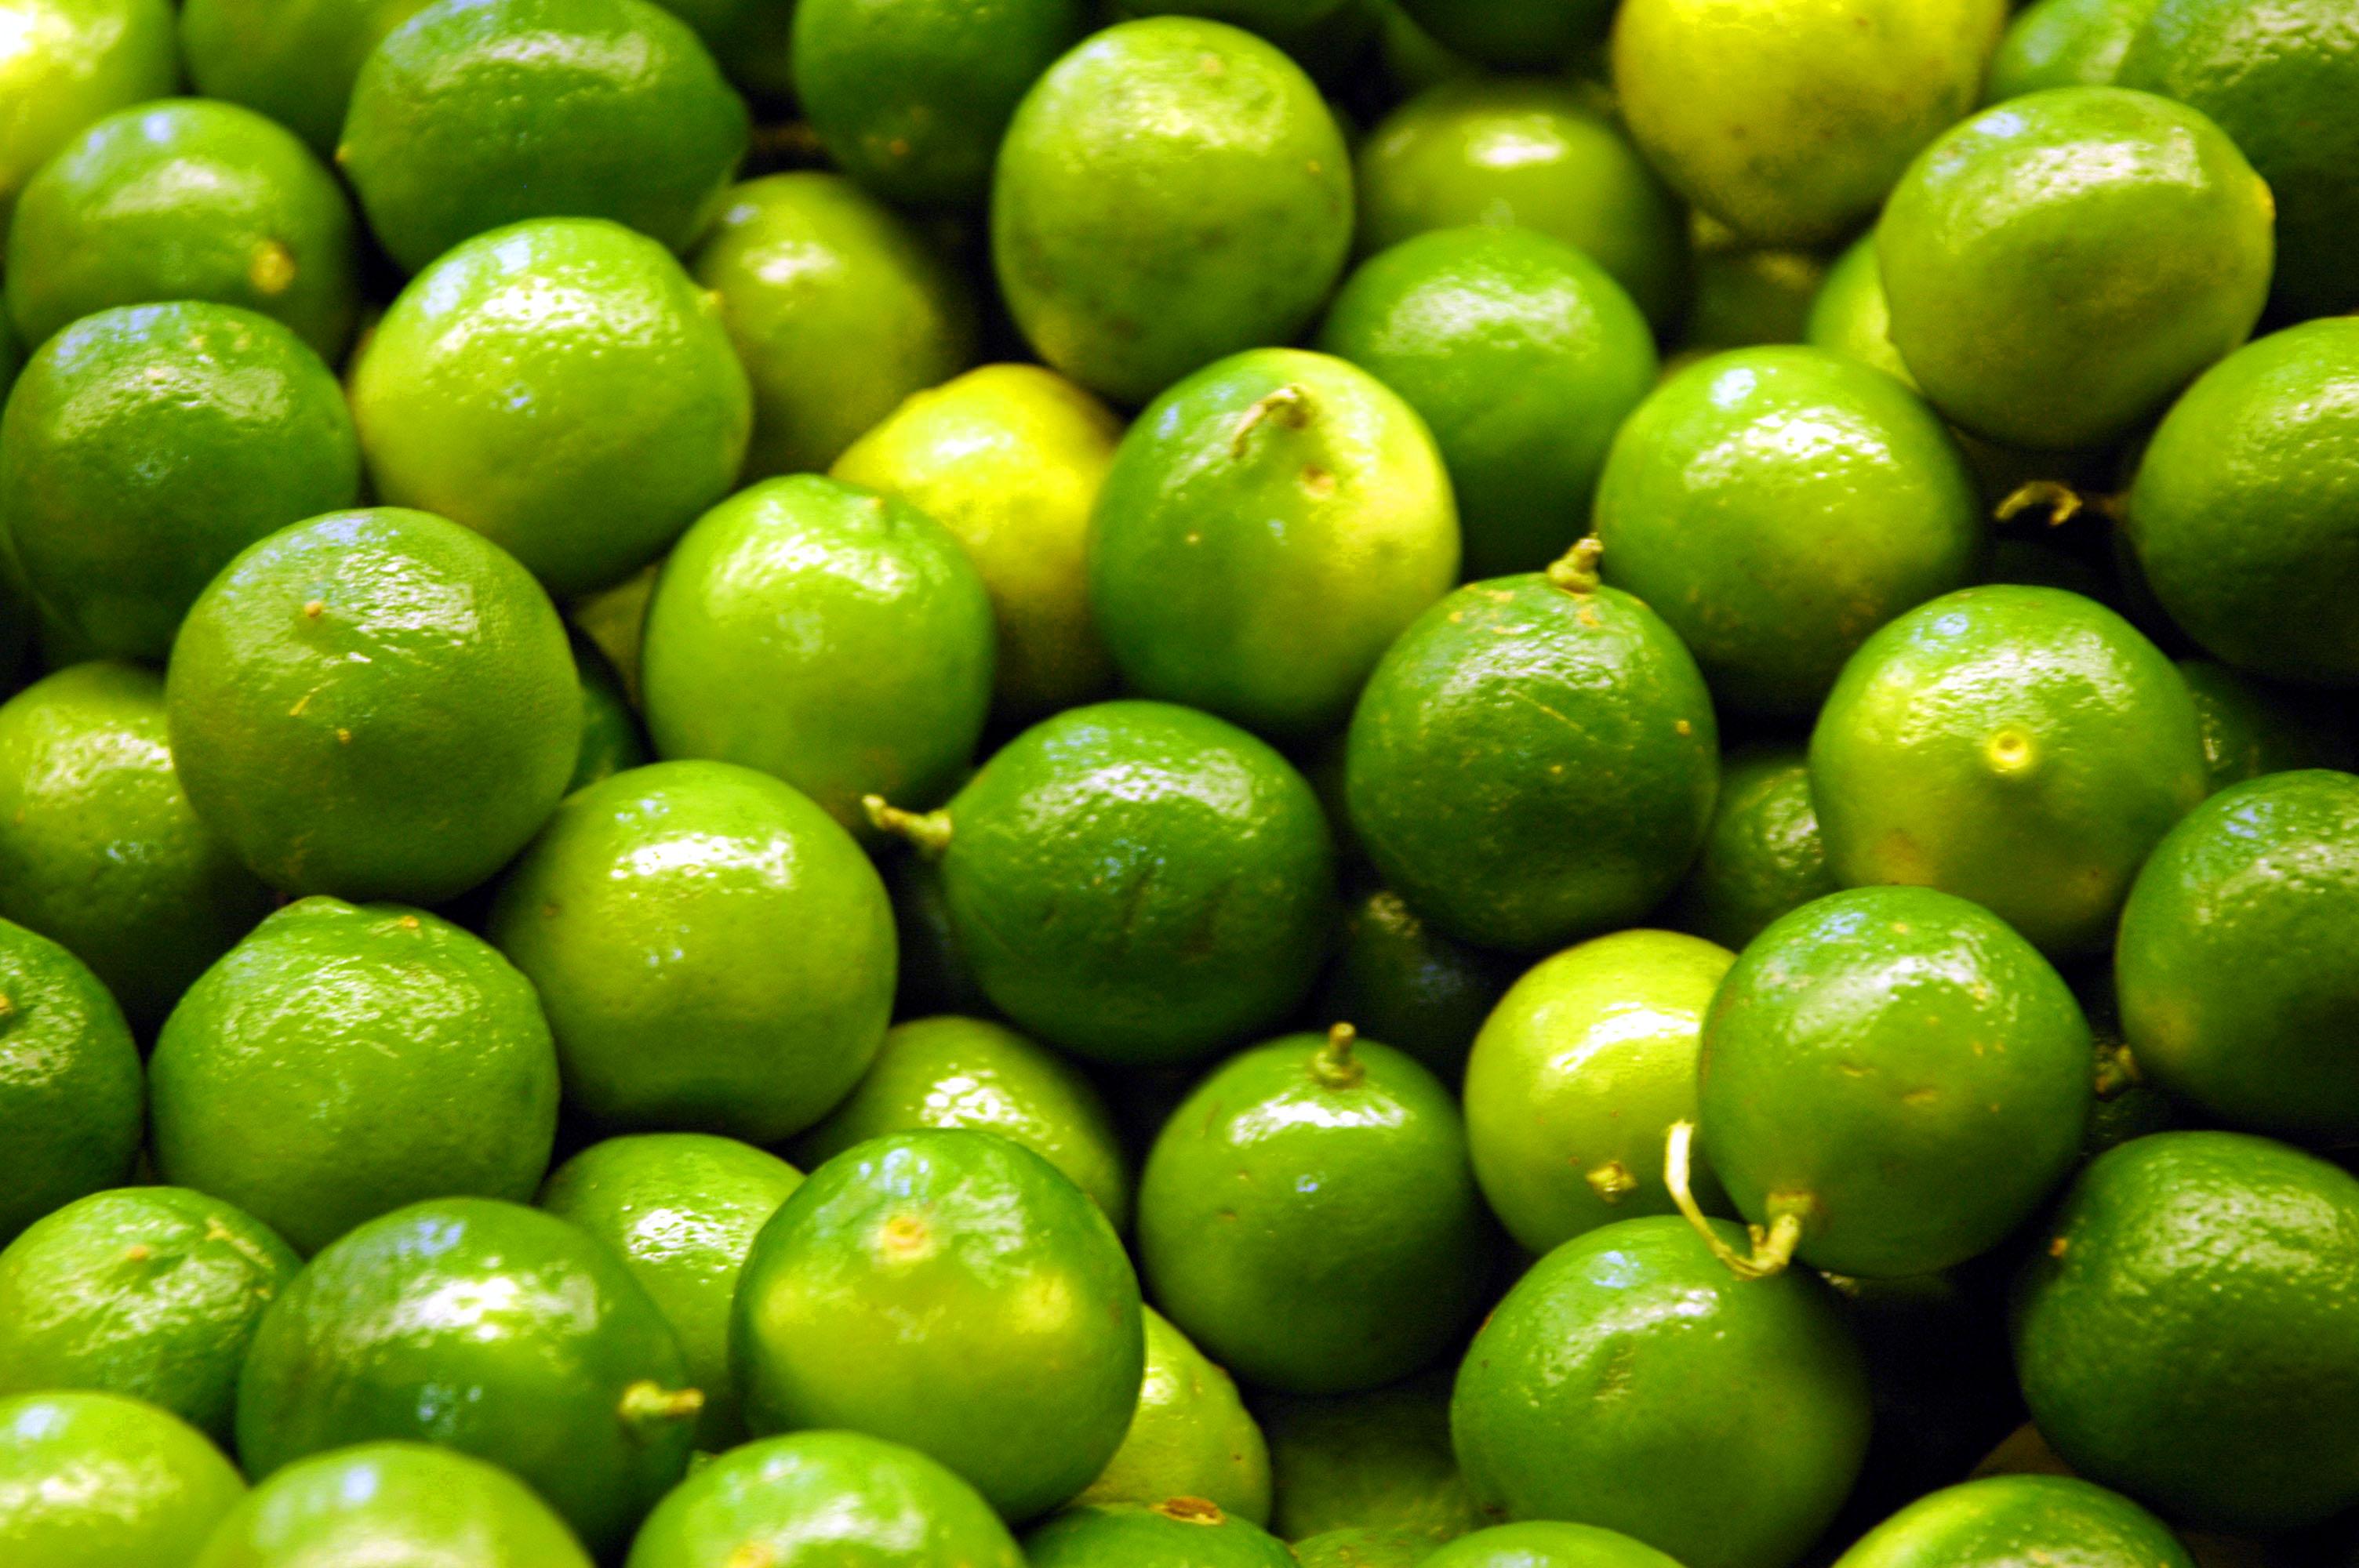 Cutbacks with Limes, Really?